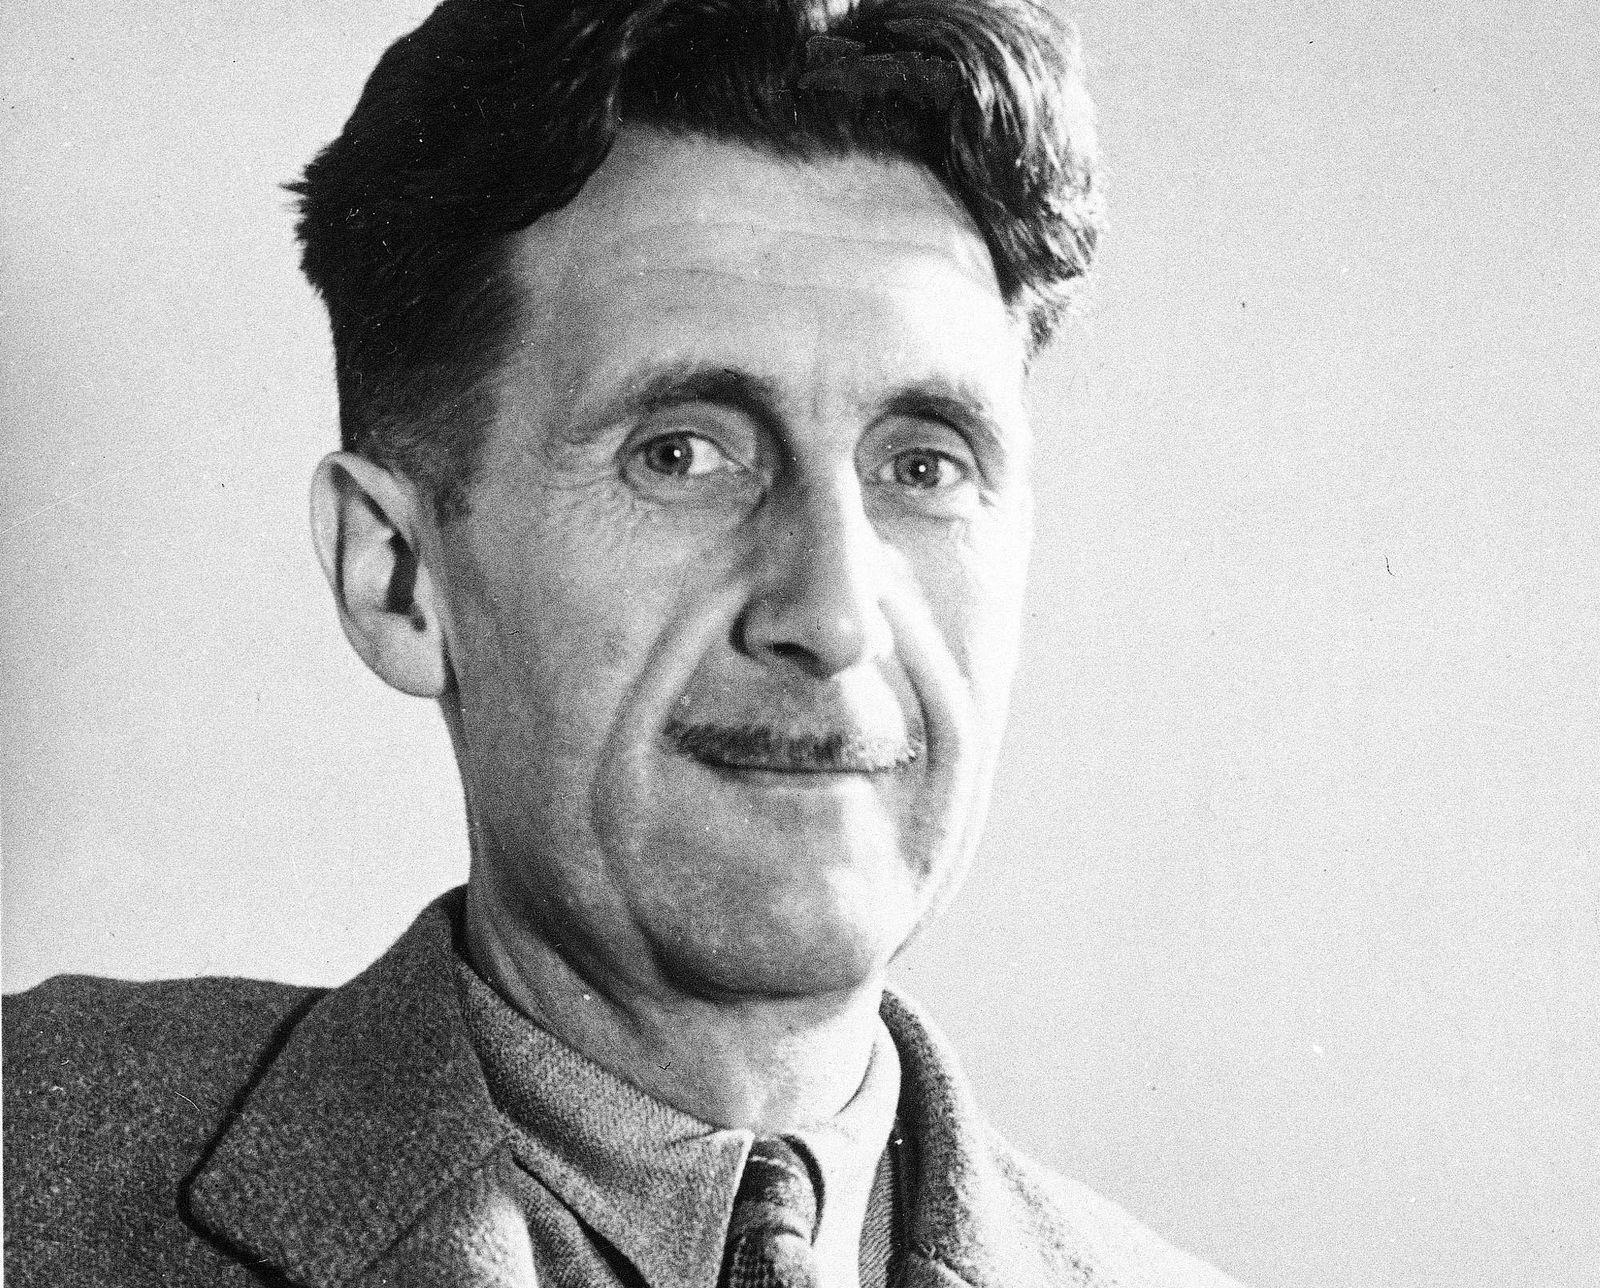 George Orwell/ 1984 / EX-Lehrer